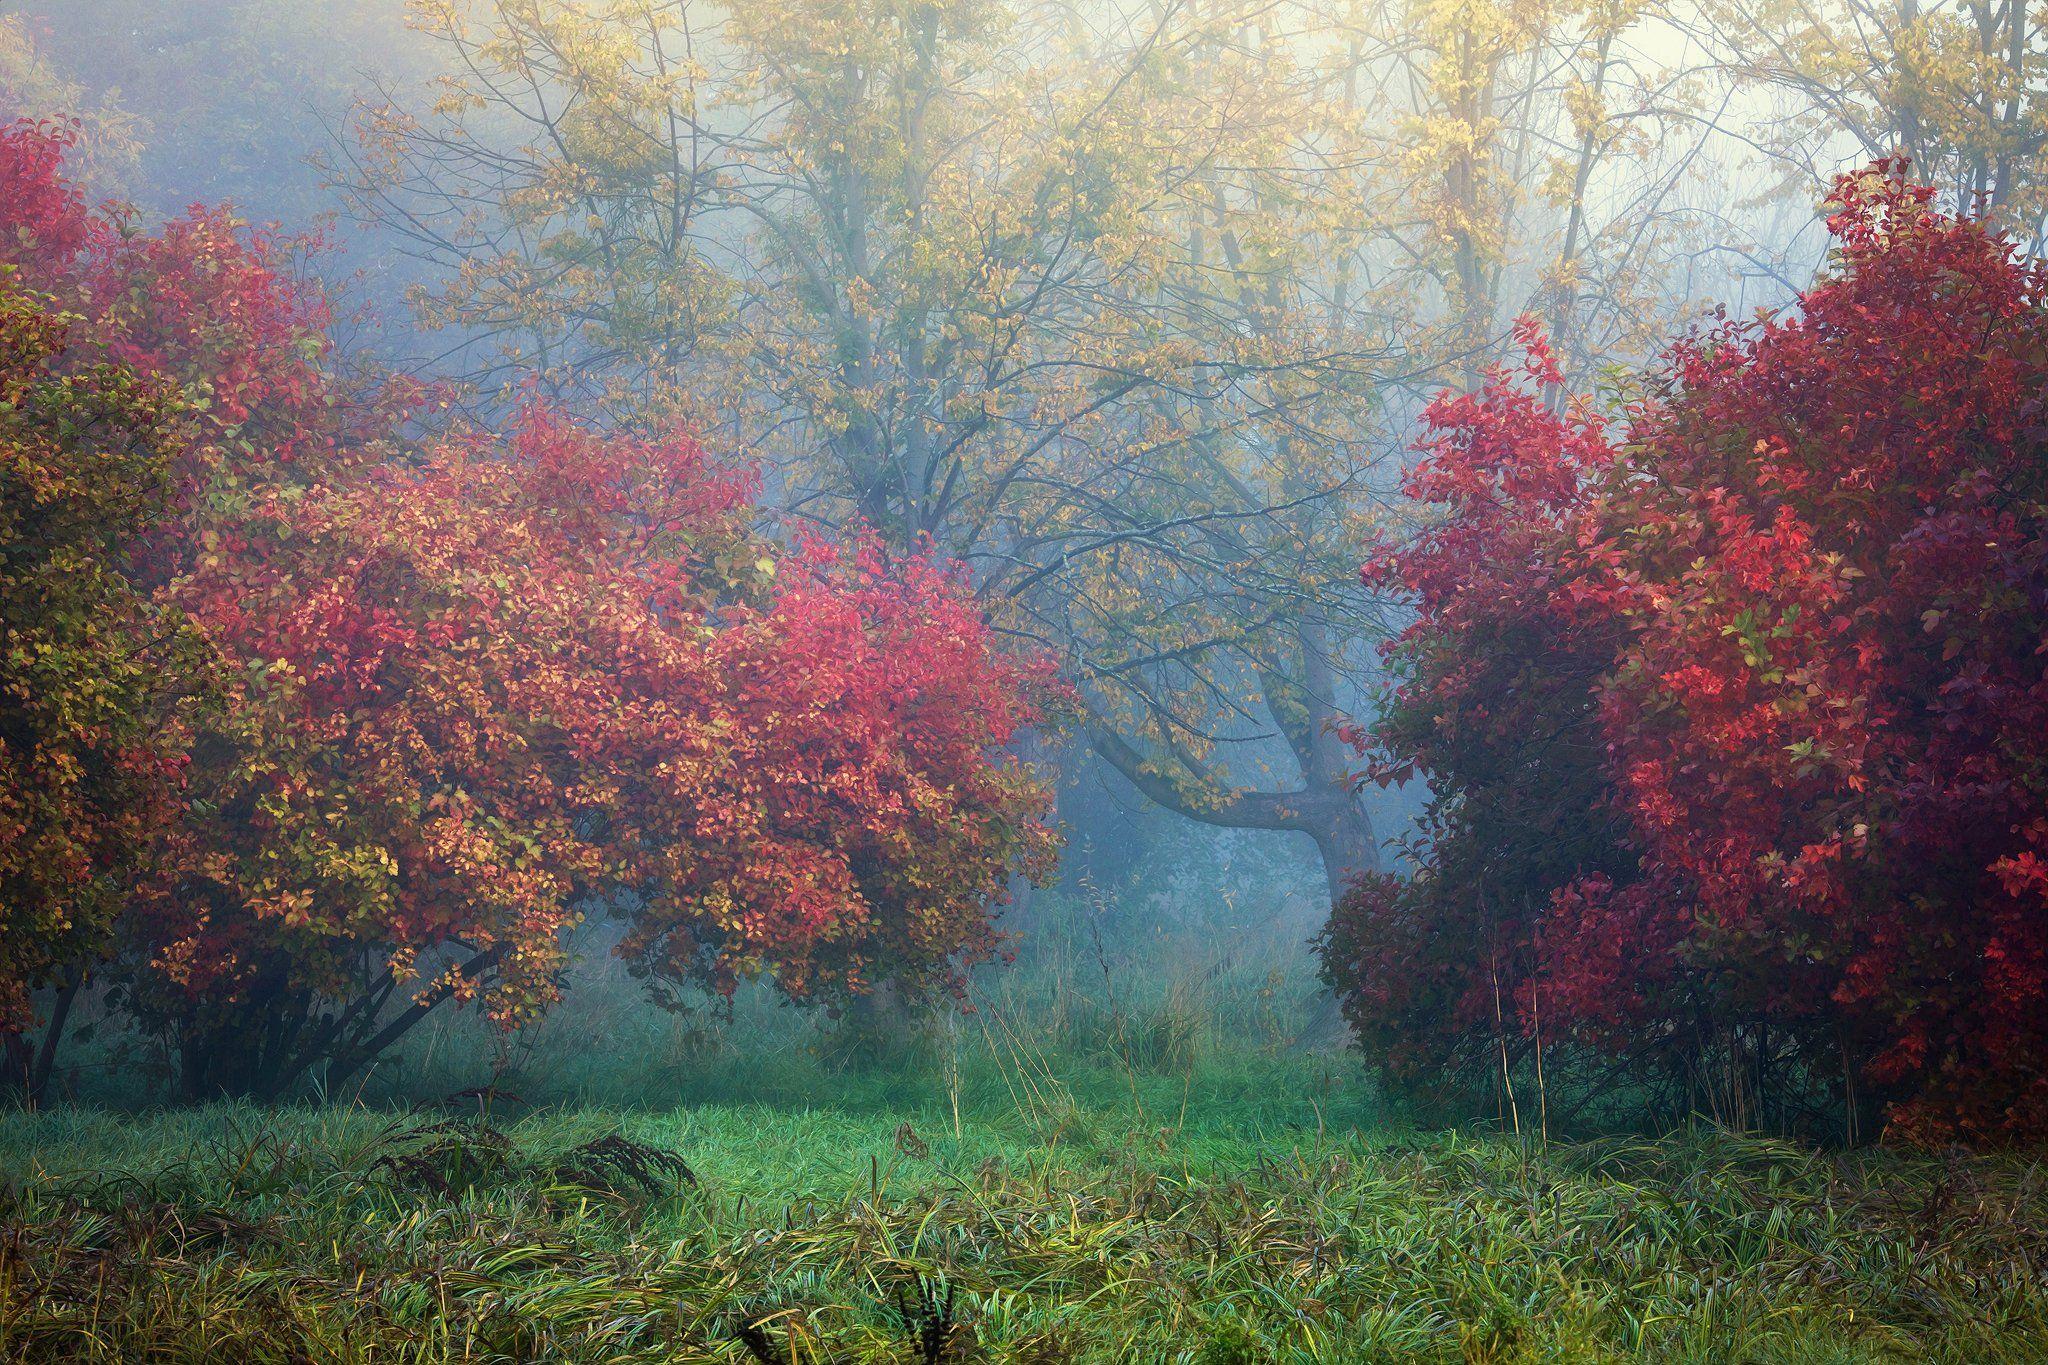 autumn symphony осенняя симфония magic garden park trees grass colourful mist foggy morning, Radoslaw Dranikowski